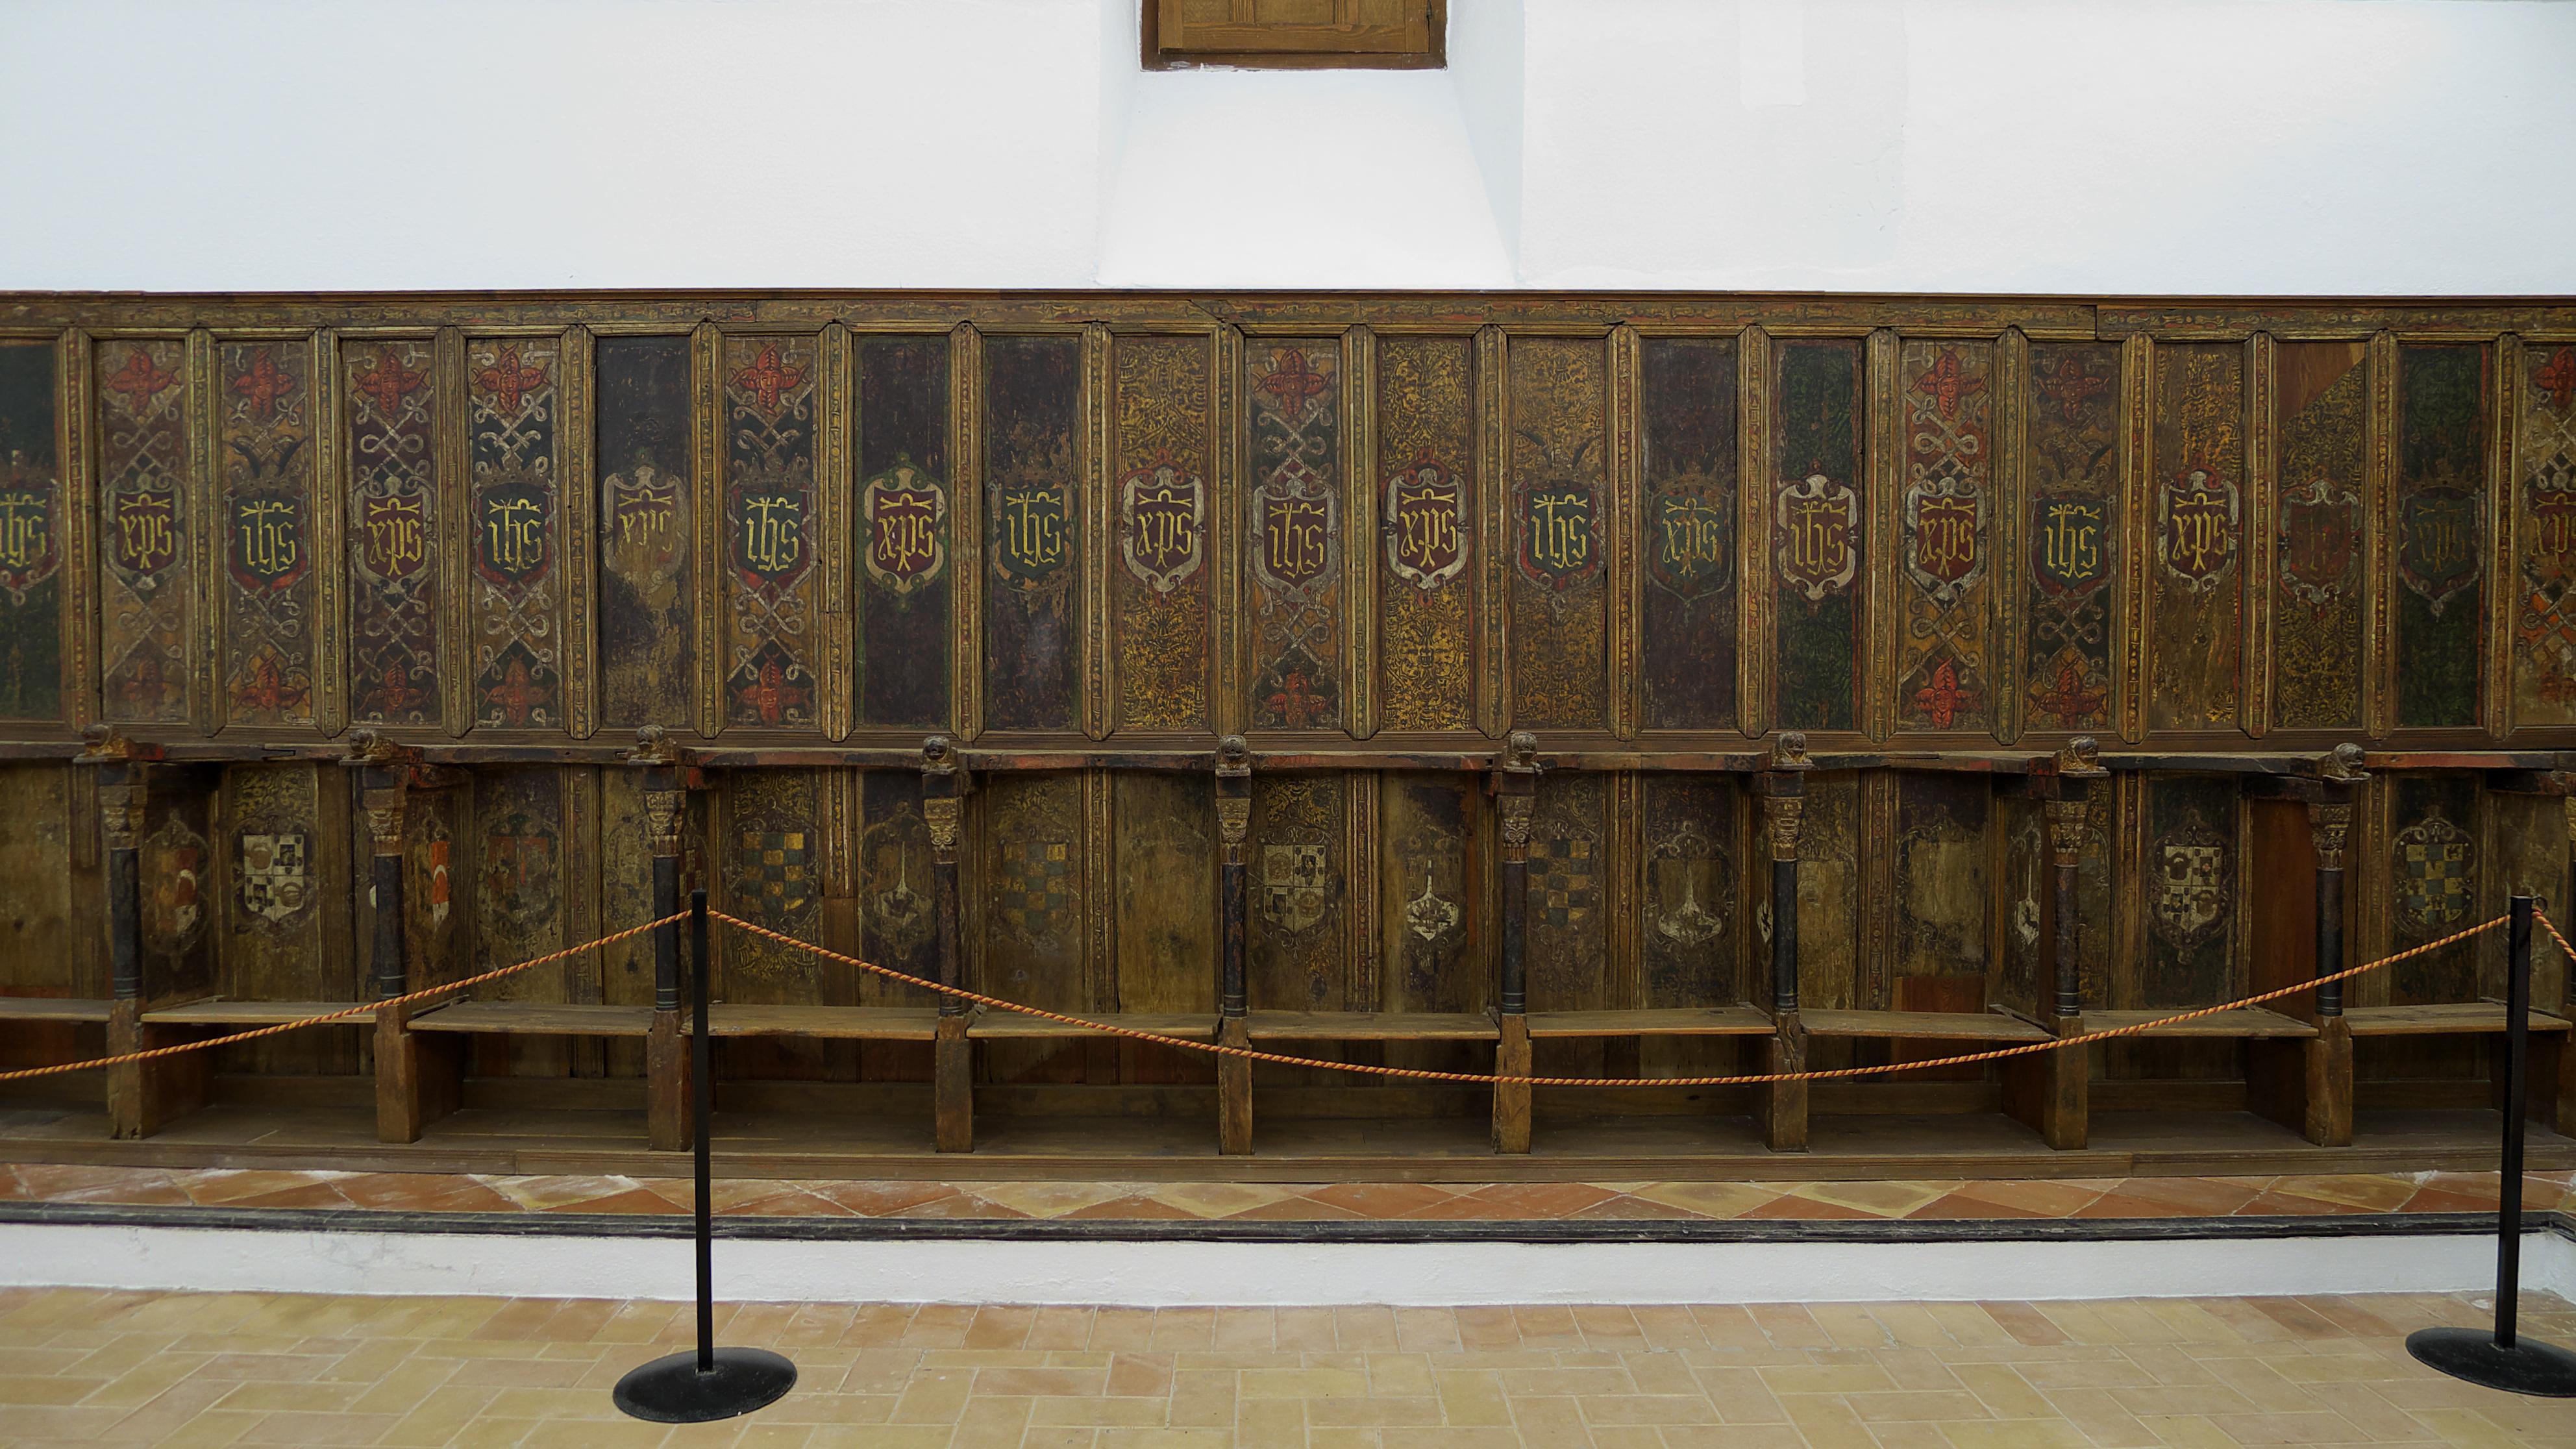 Monasterio de Santa Clara (Moguer) - Wikiwand